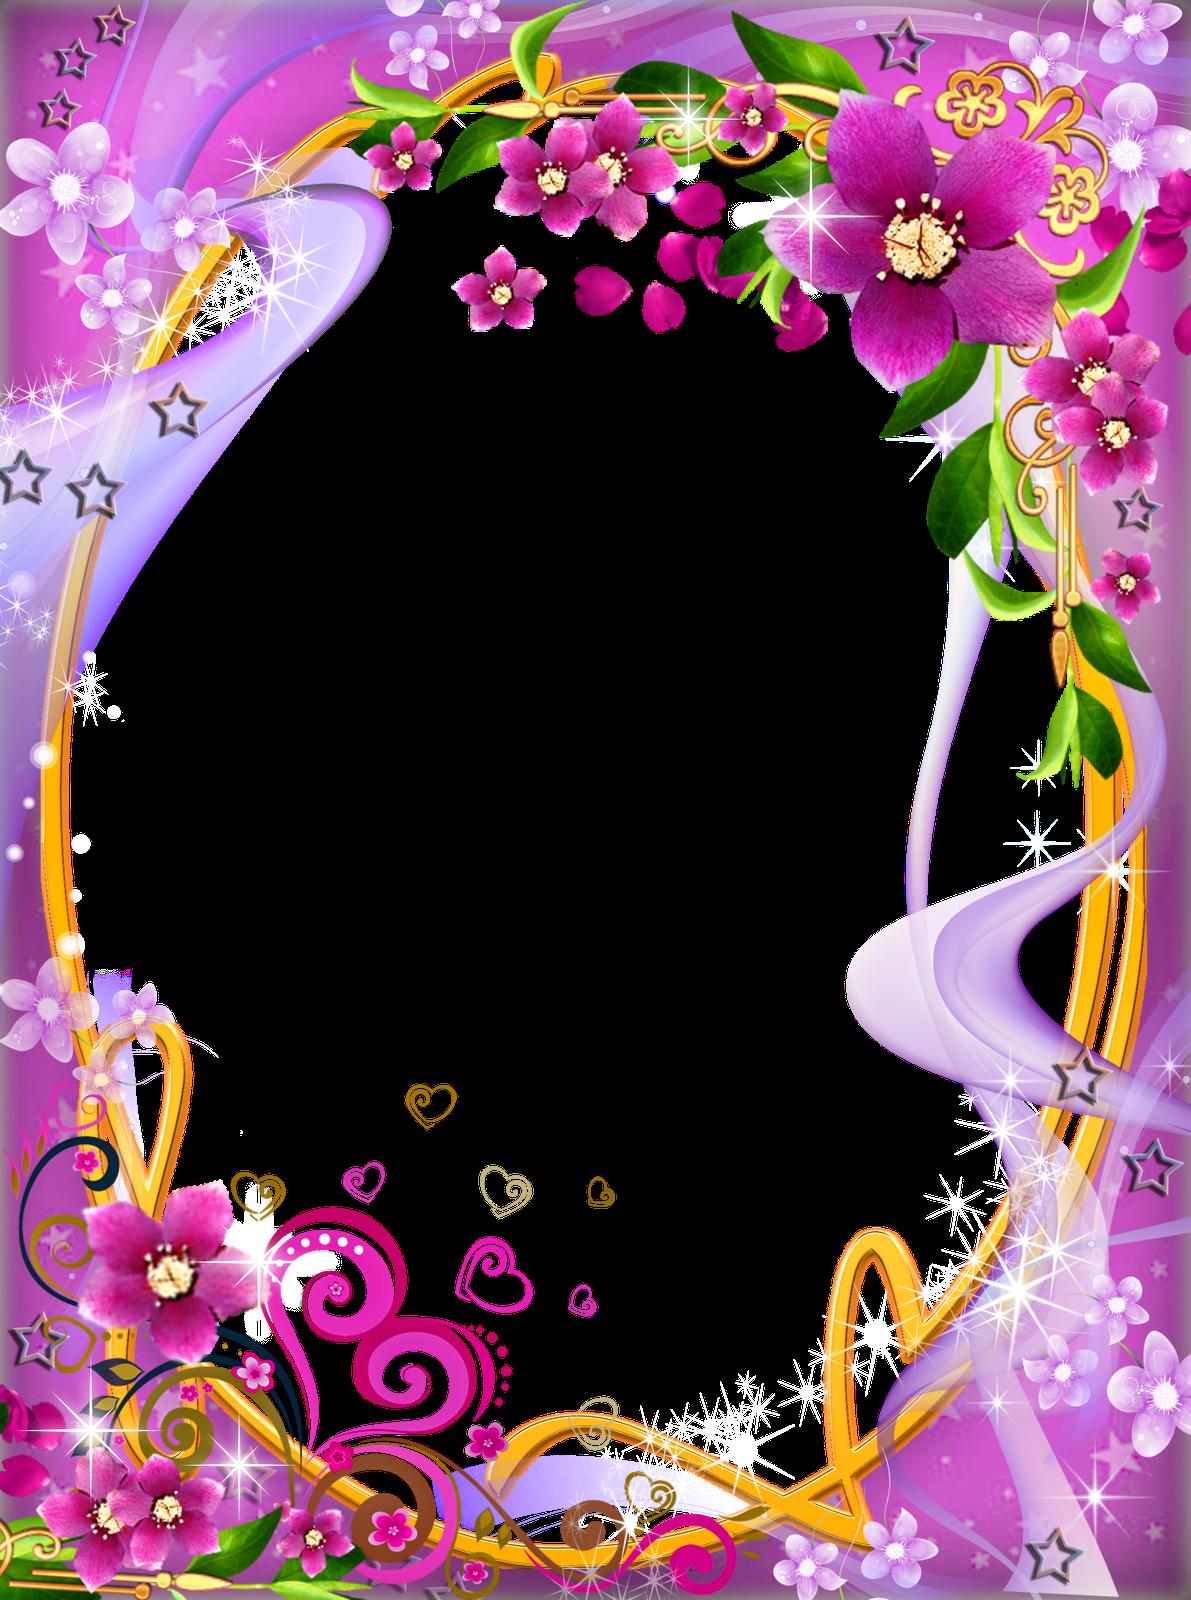 photoshop frame png | Marcadores: flores png , molduras e frames png ...